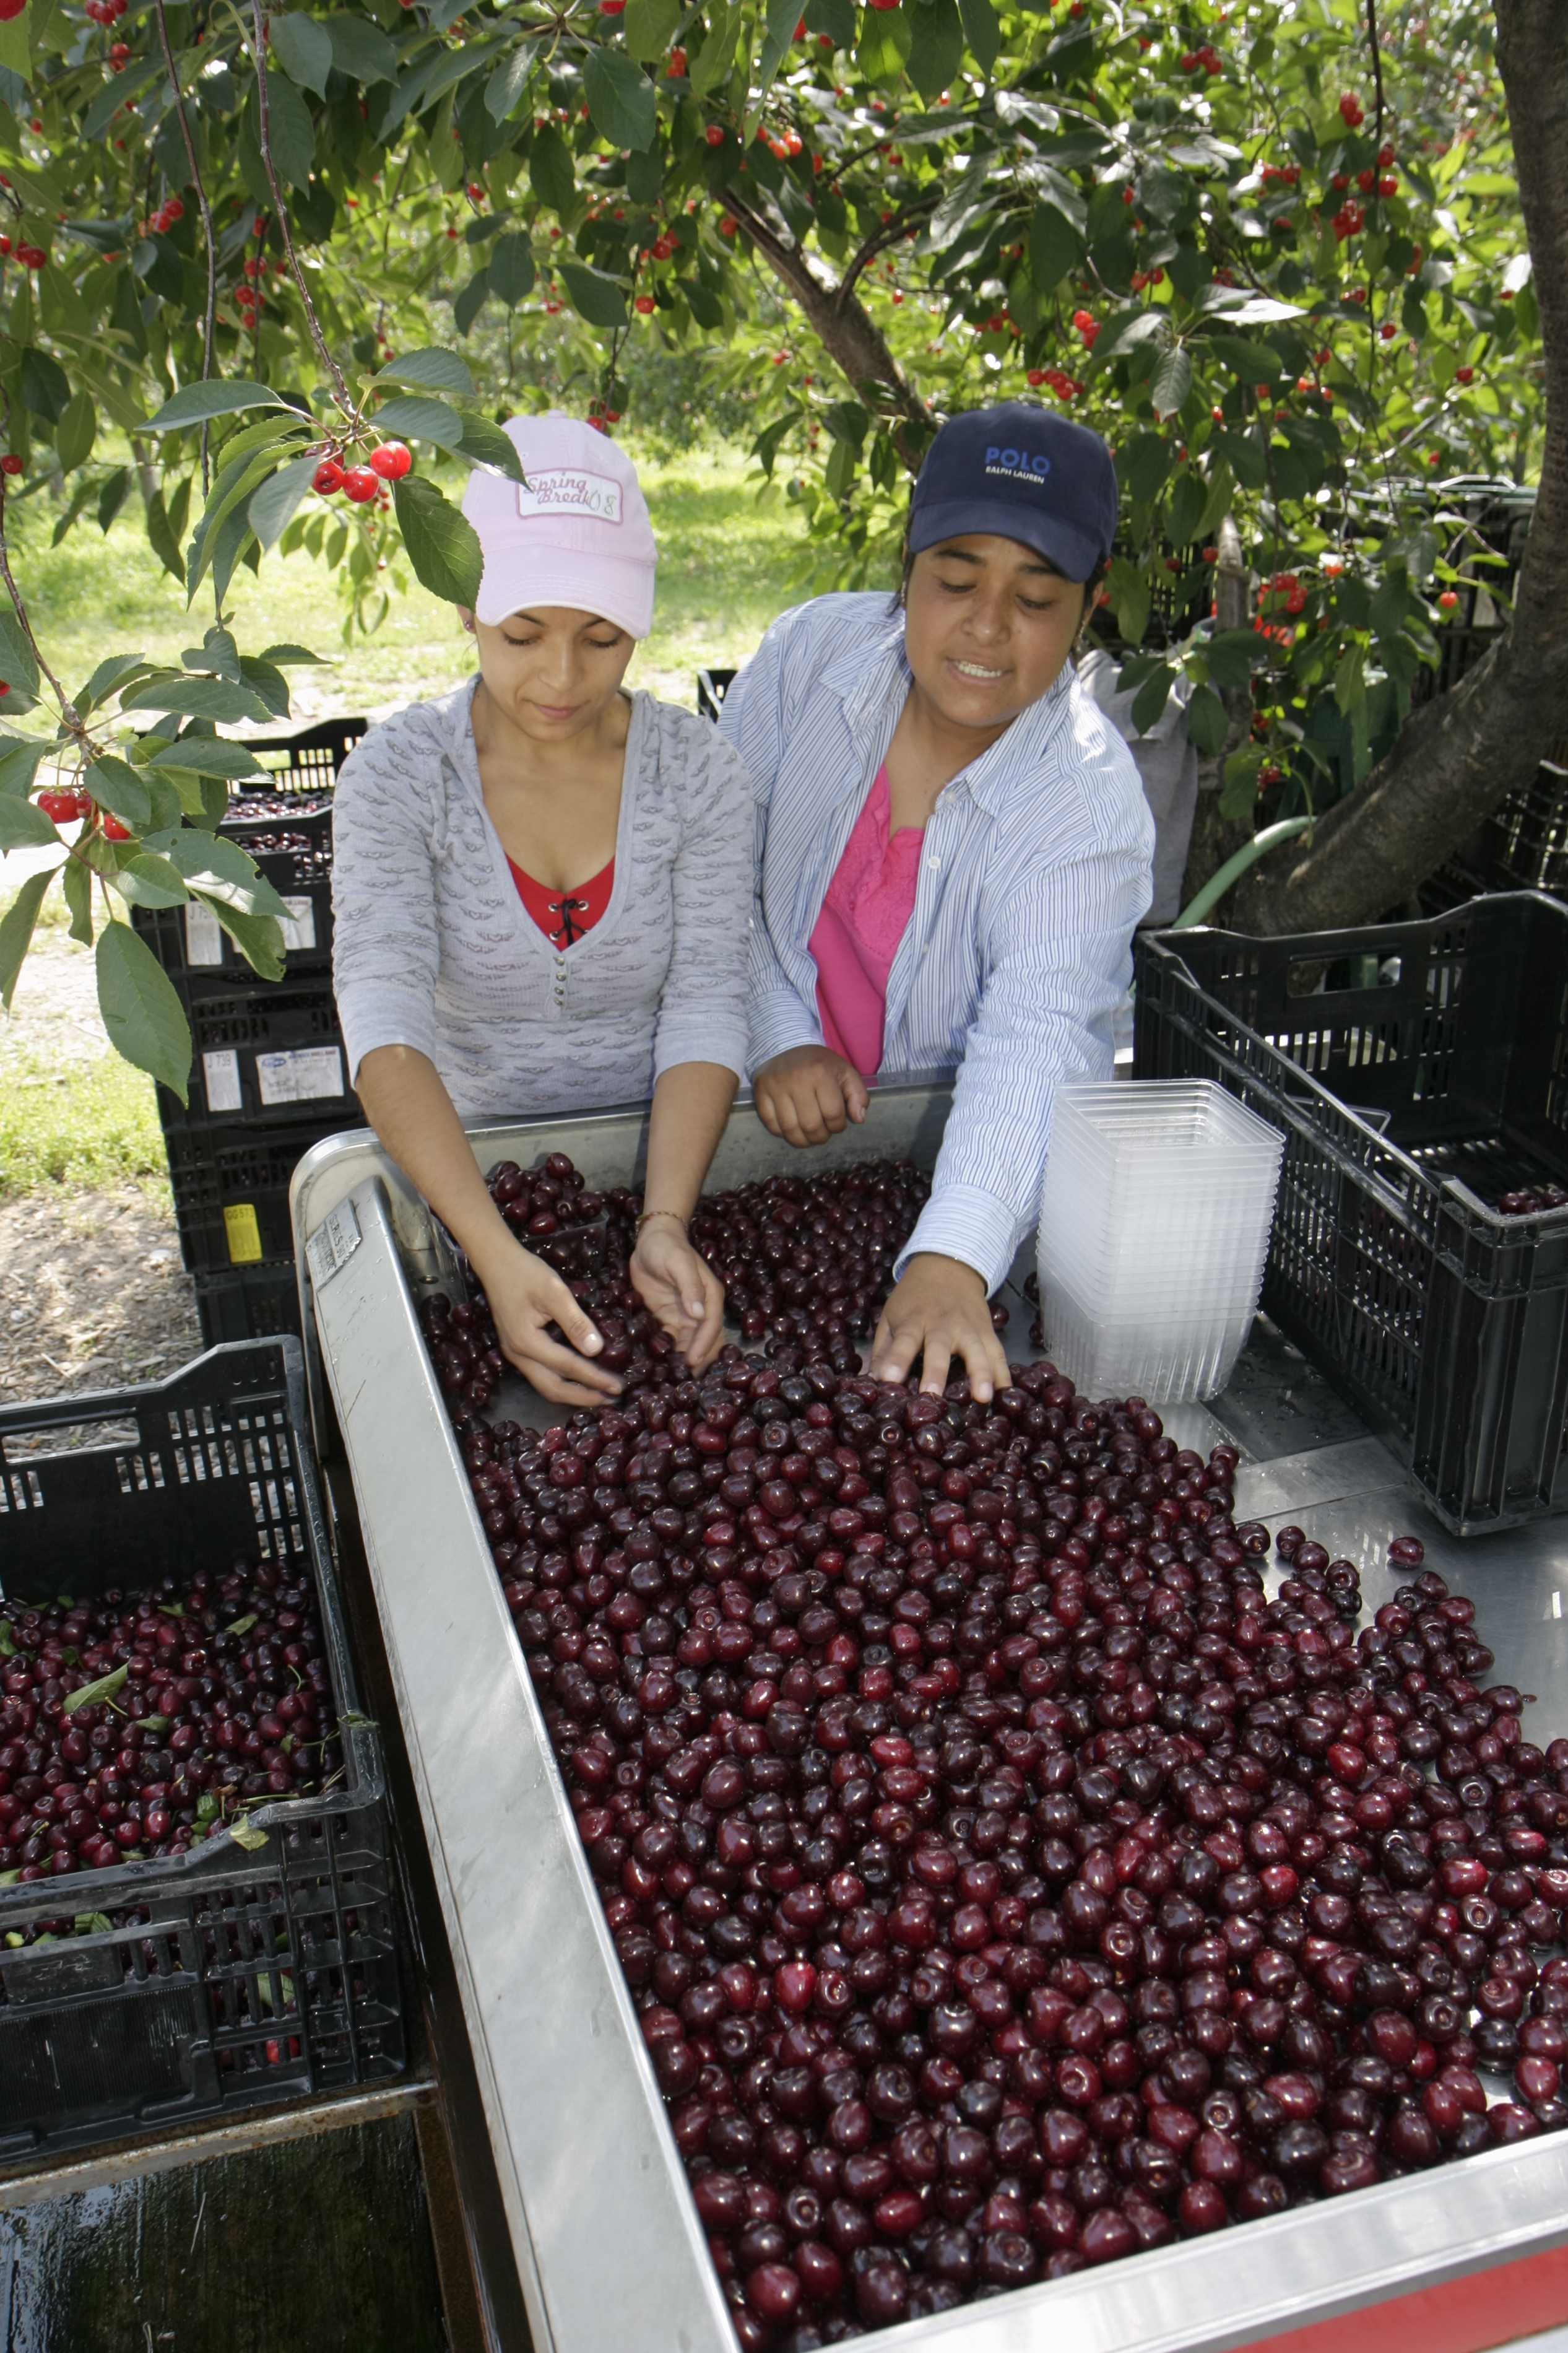 Women harvesting sweet cherries.